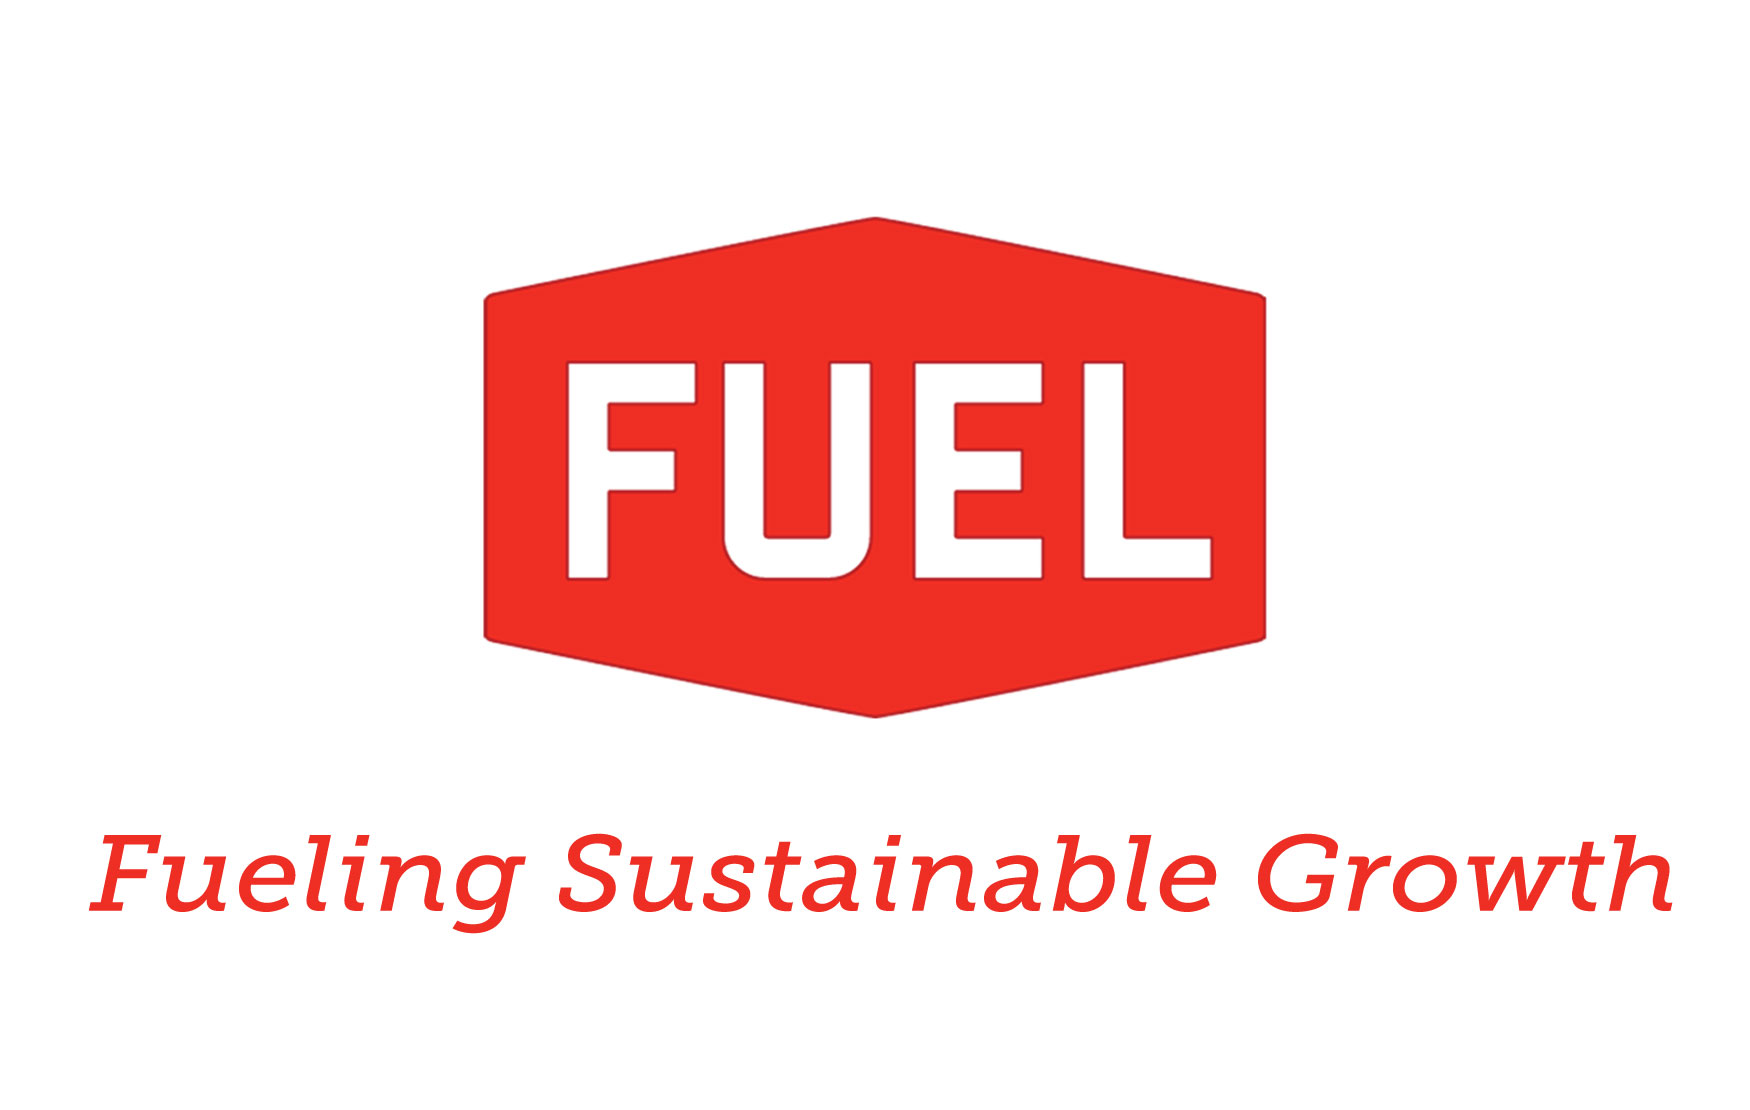 fuel logo design